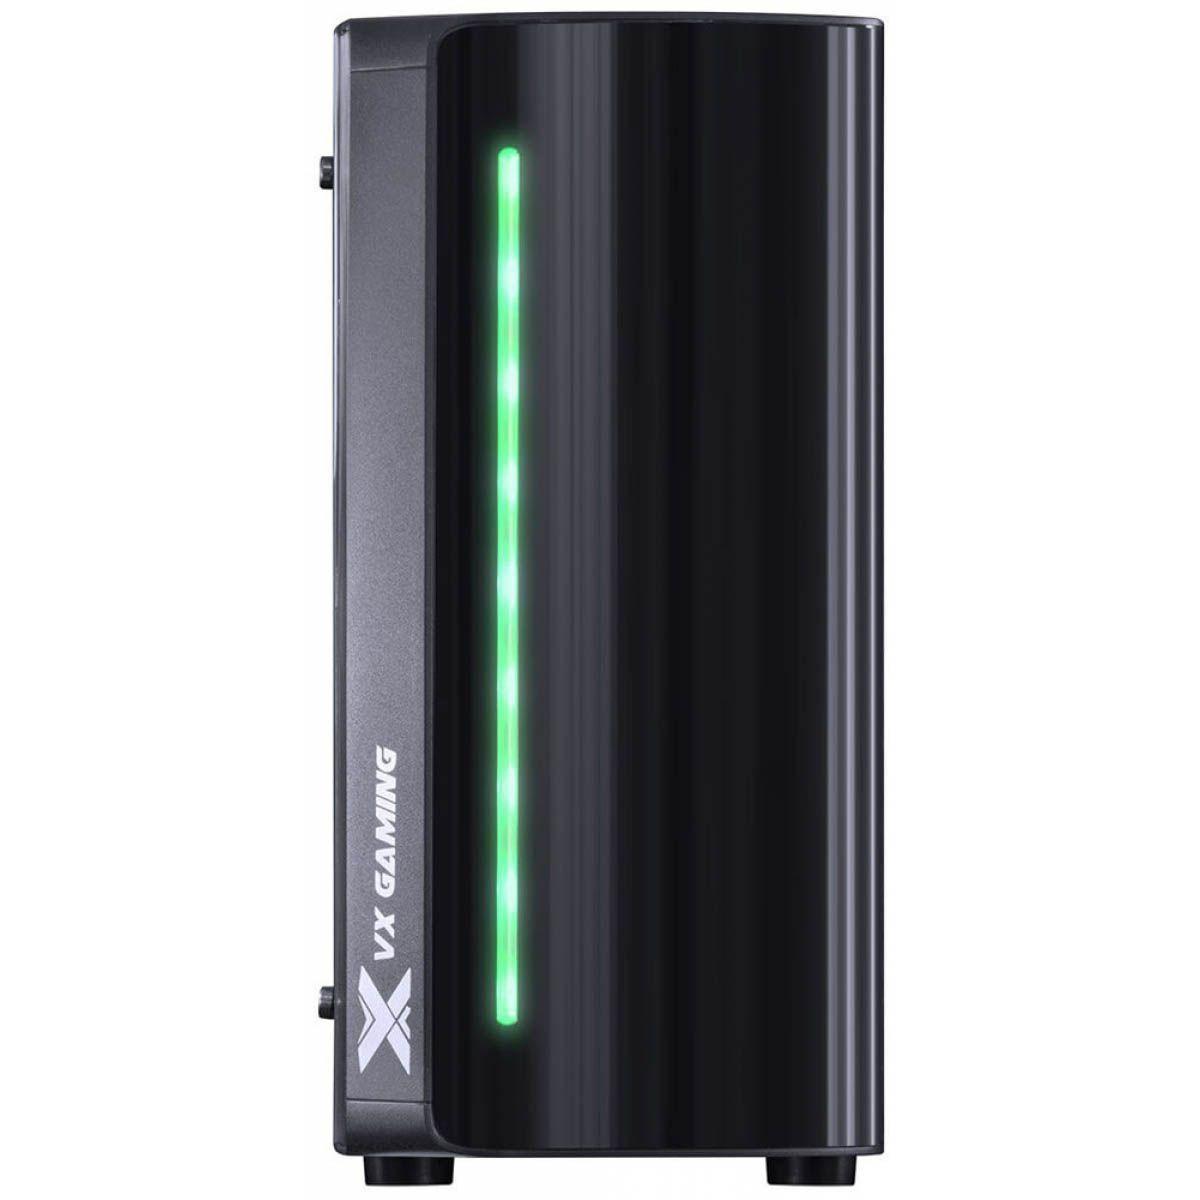 Gabinete Vx Spectrum Rgb 7 Cores Lateral Acrílico MidTower